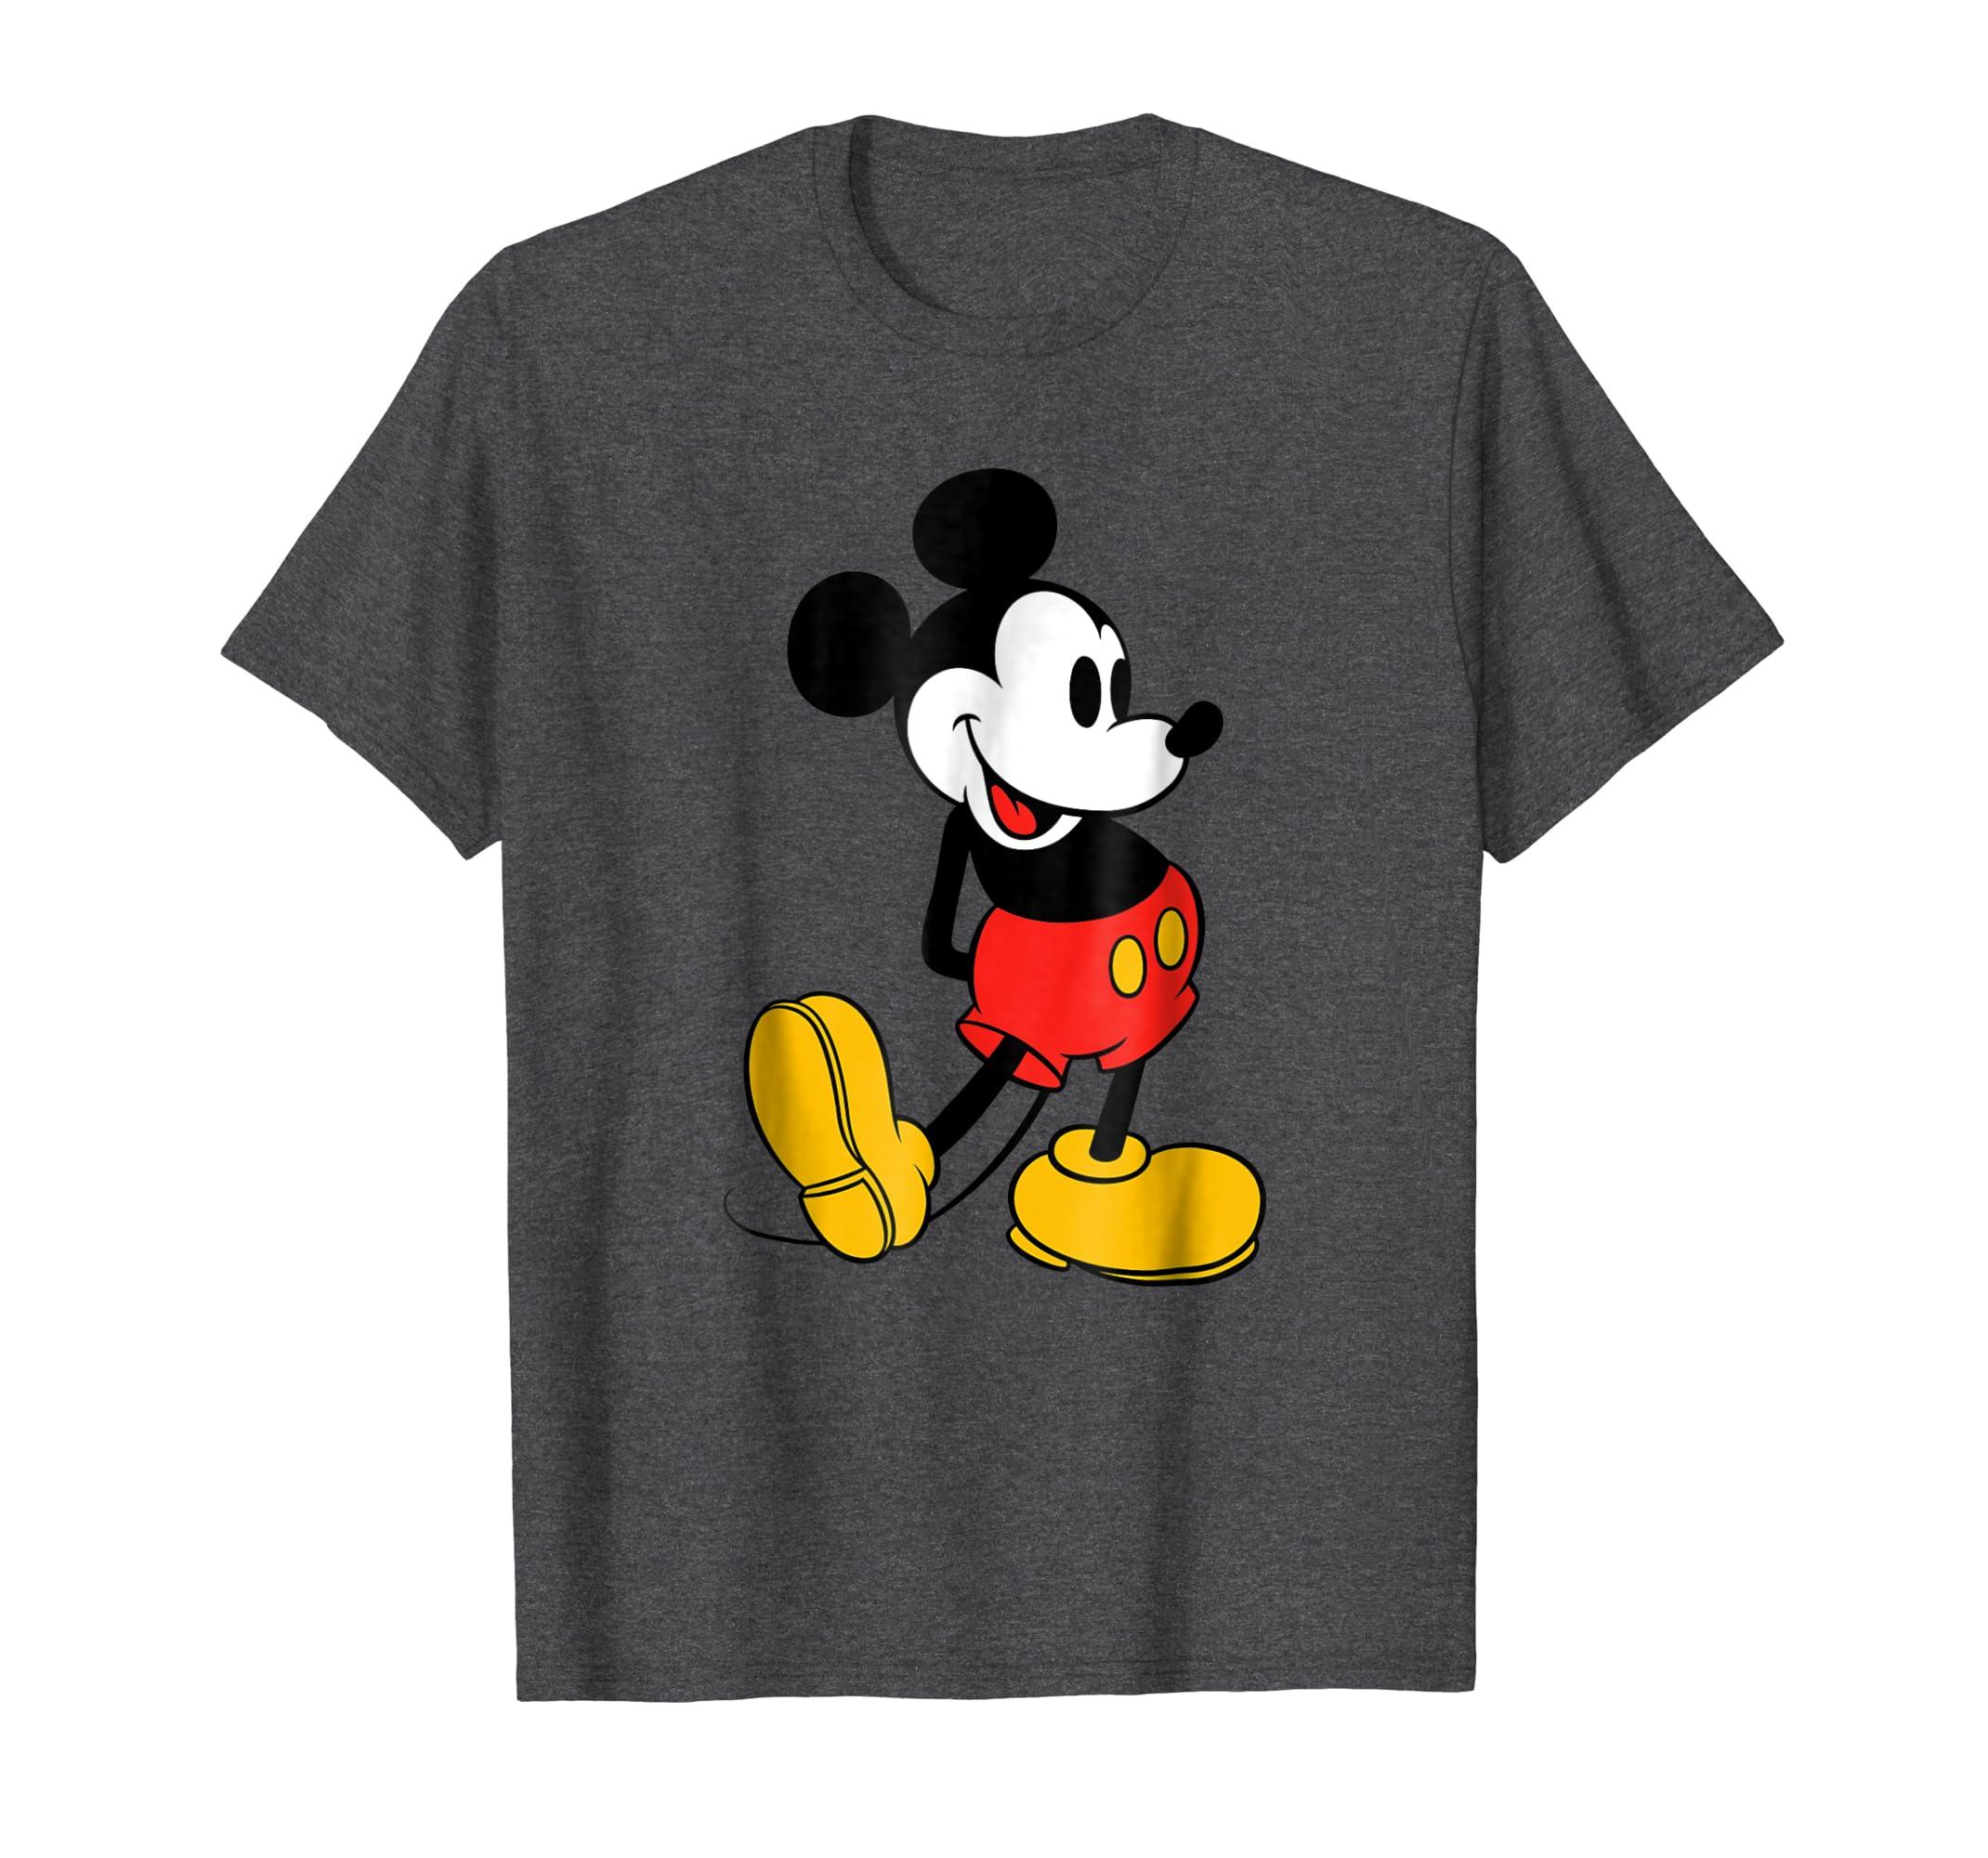 2120cbb77e1 Amazon.com  Disney Classic Mickey Mouse T-Shirt  Clothing